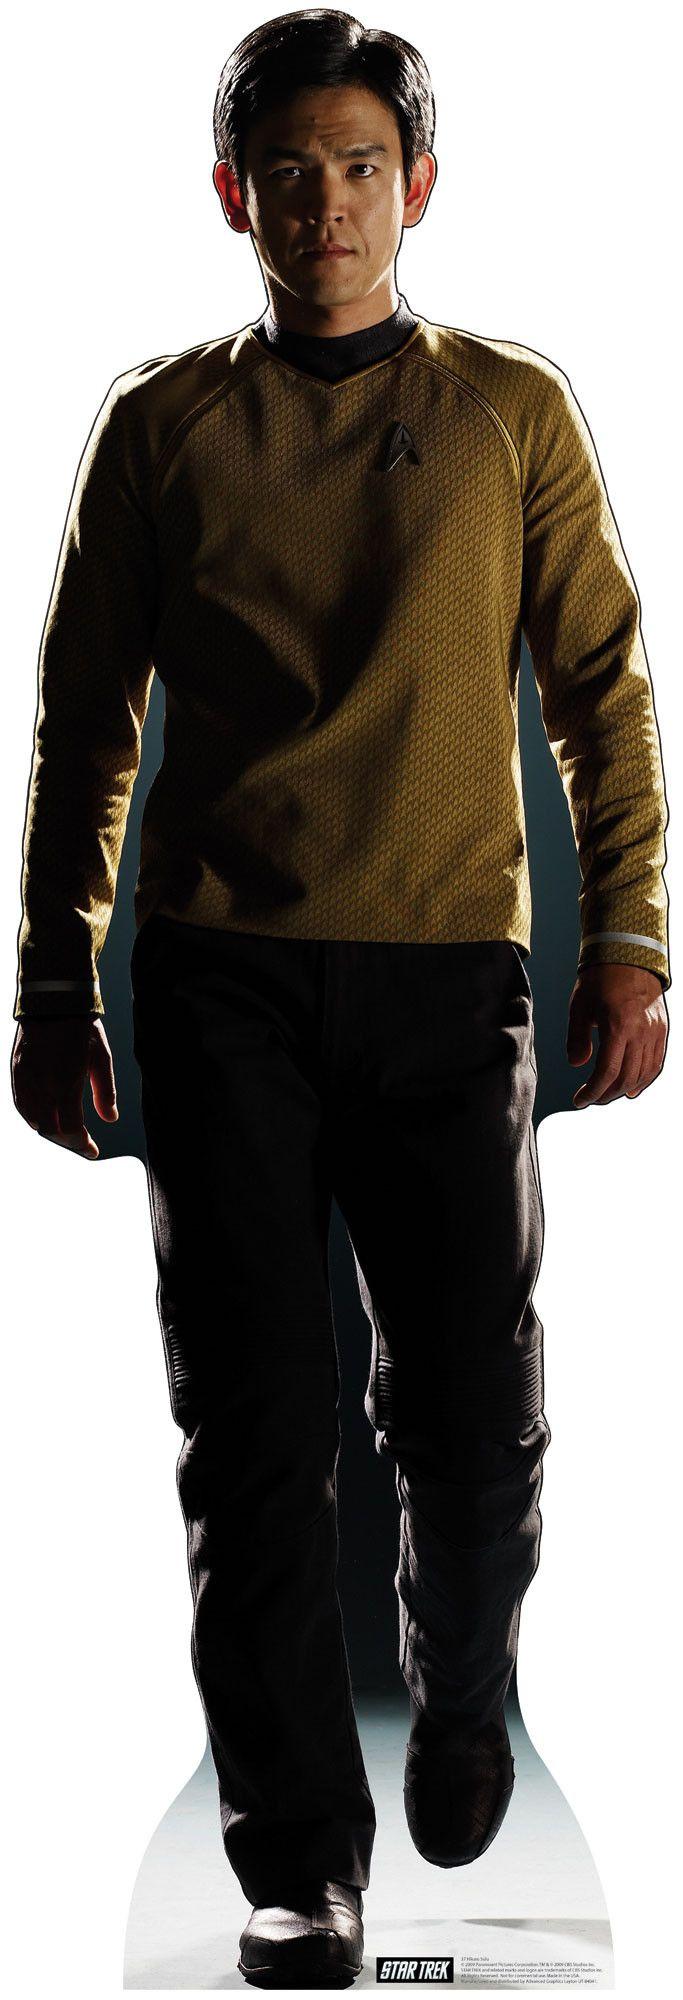 Star Trek Hikaru Sulu Cardboard Stand-Up